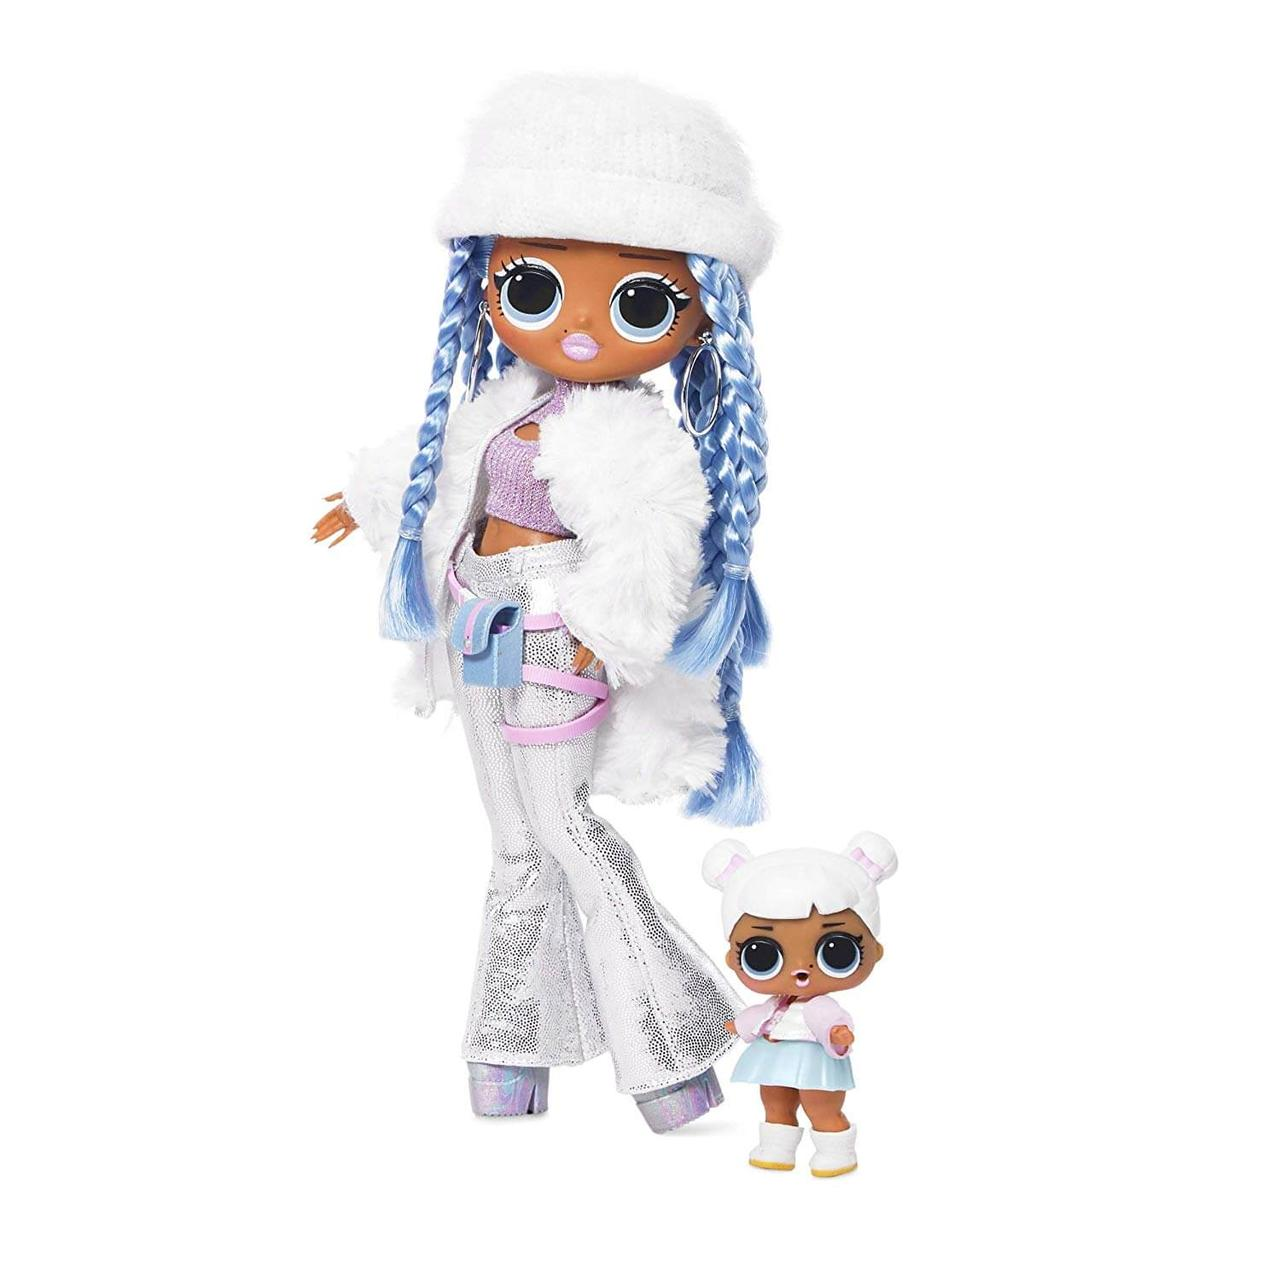 L.O.L. Surprise! O.M.G. Winter Disco Snowlicious & Sister Кукла Снежная и ее сестра Снежный Ангел